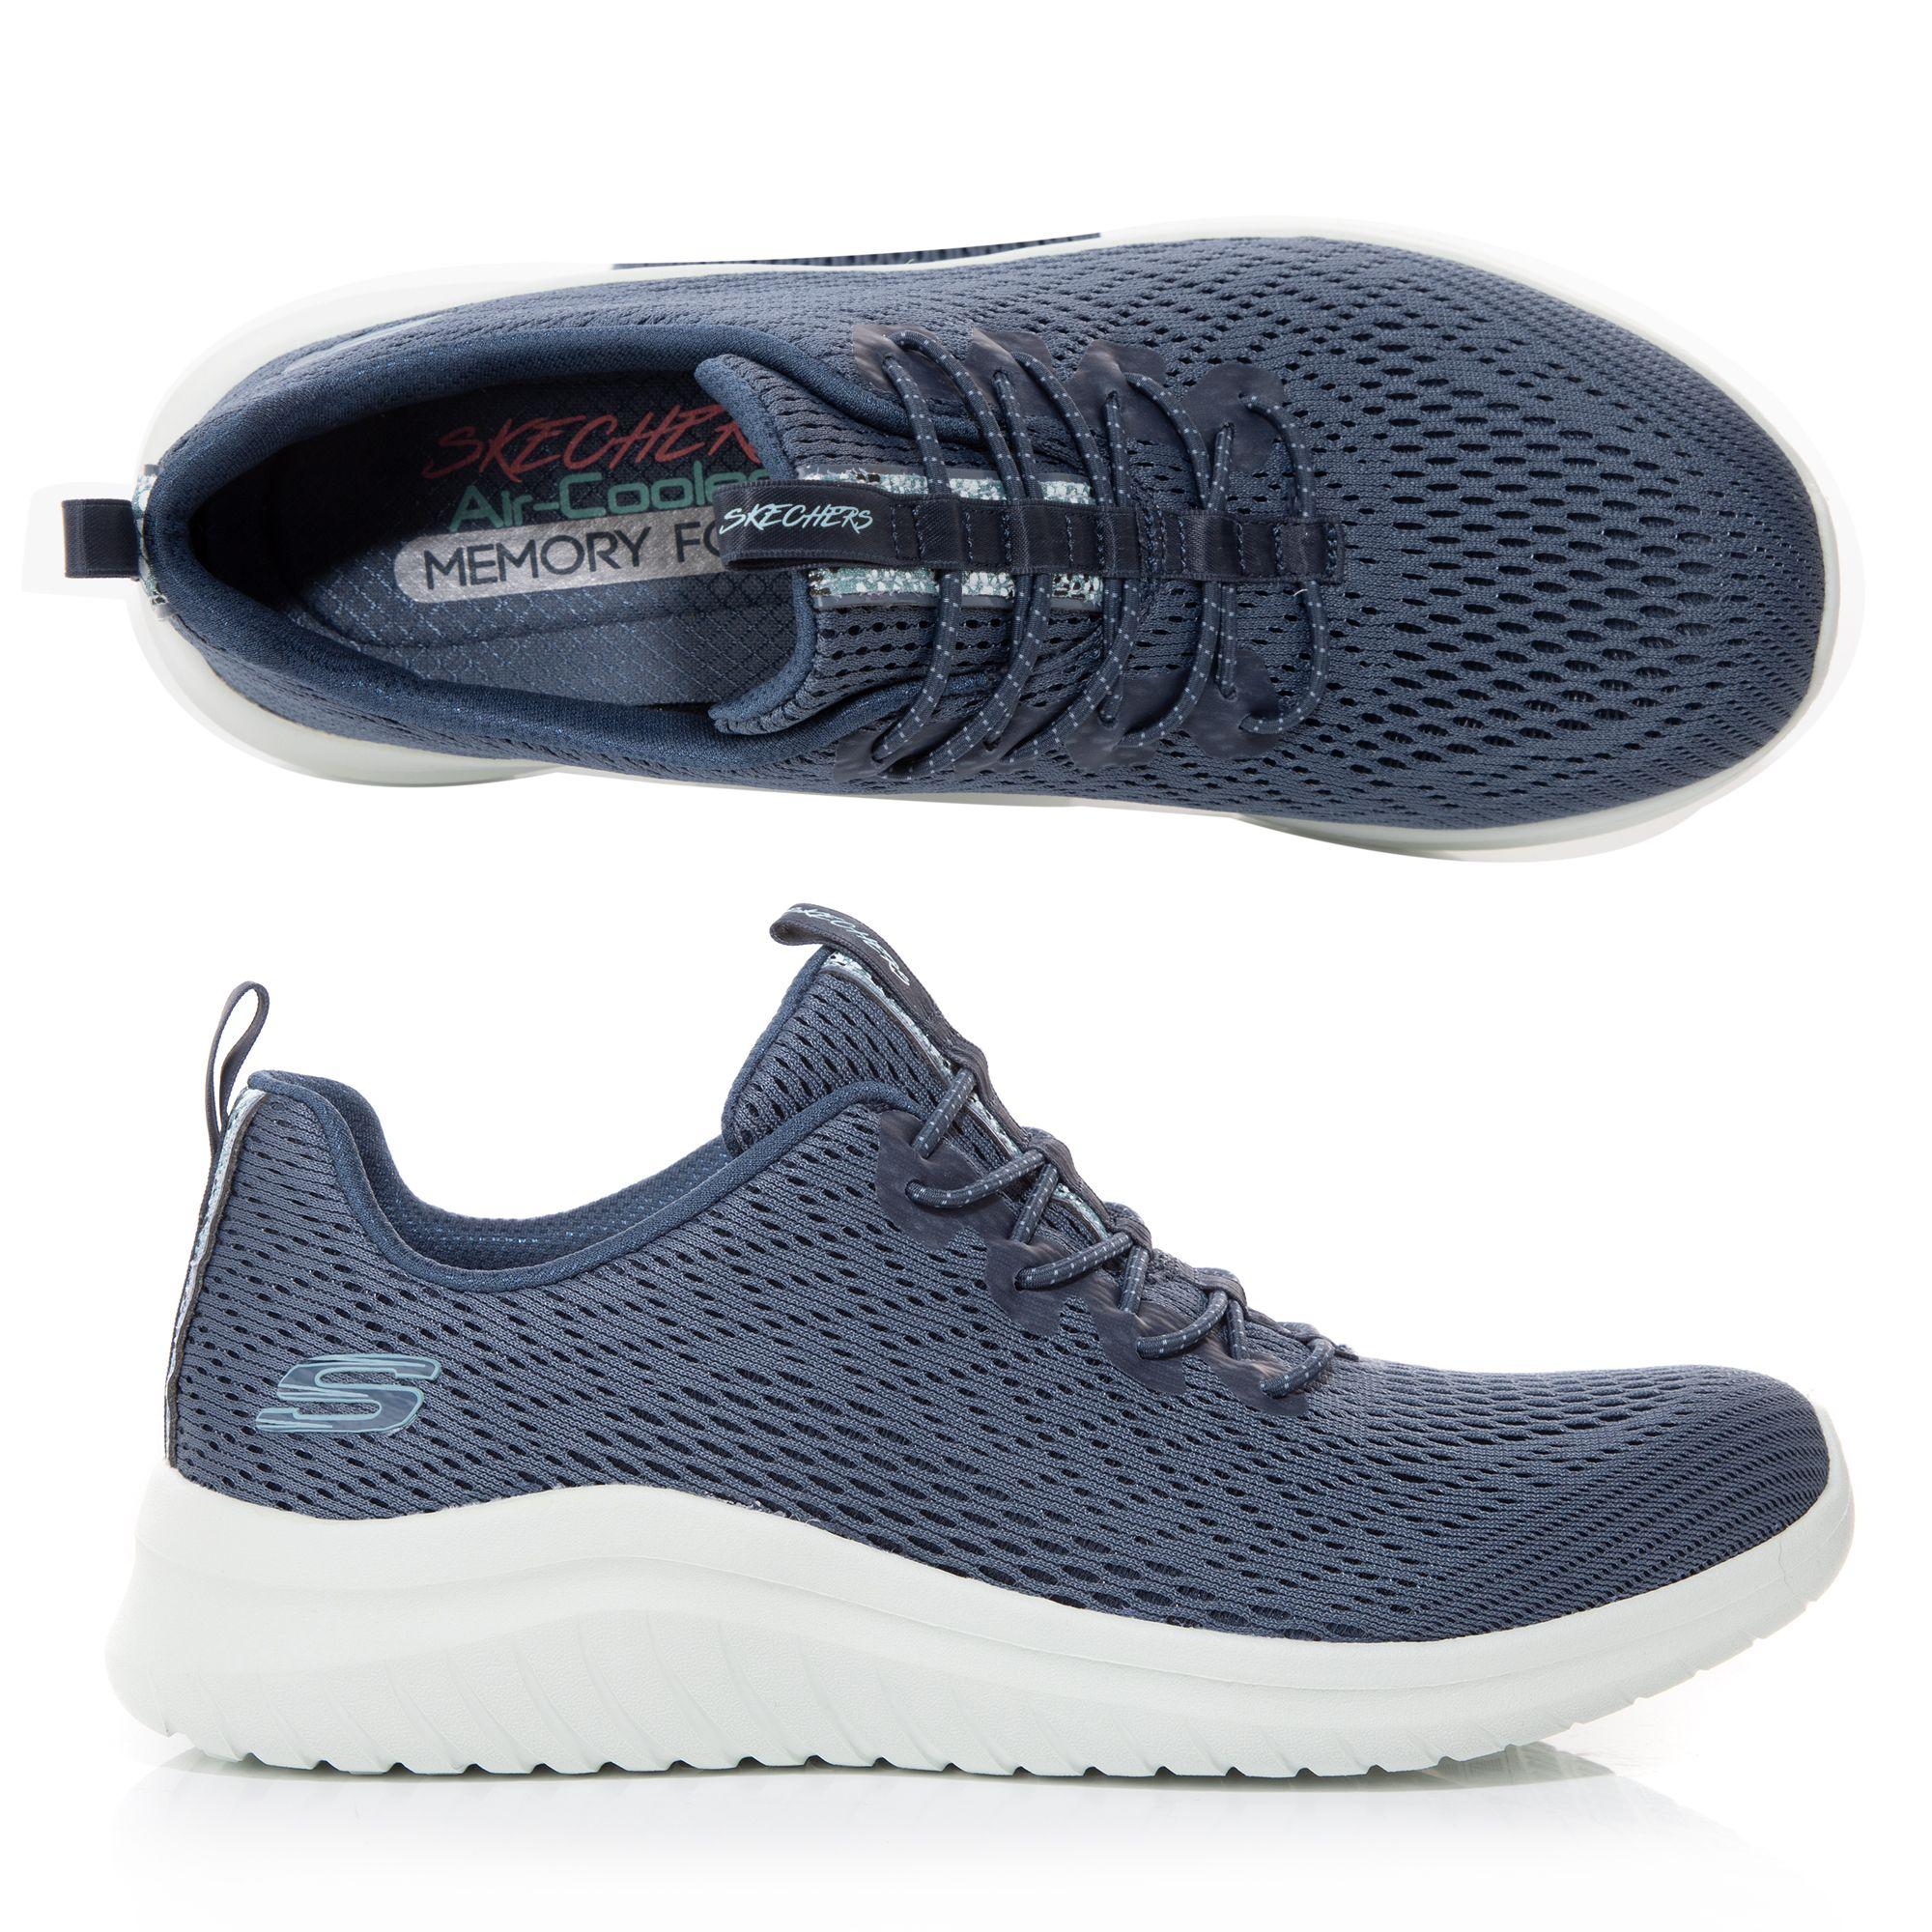 various colors cf8da 62c30 SKECHERS Damen-Sneaker Ultra Flex 2.0 Textil&Mesh Memory Foam — QVC.de